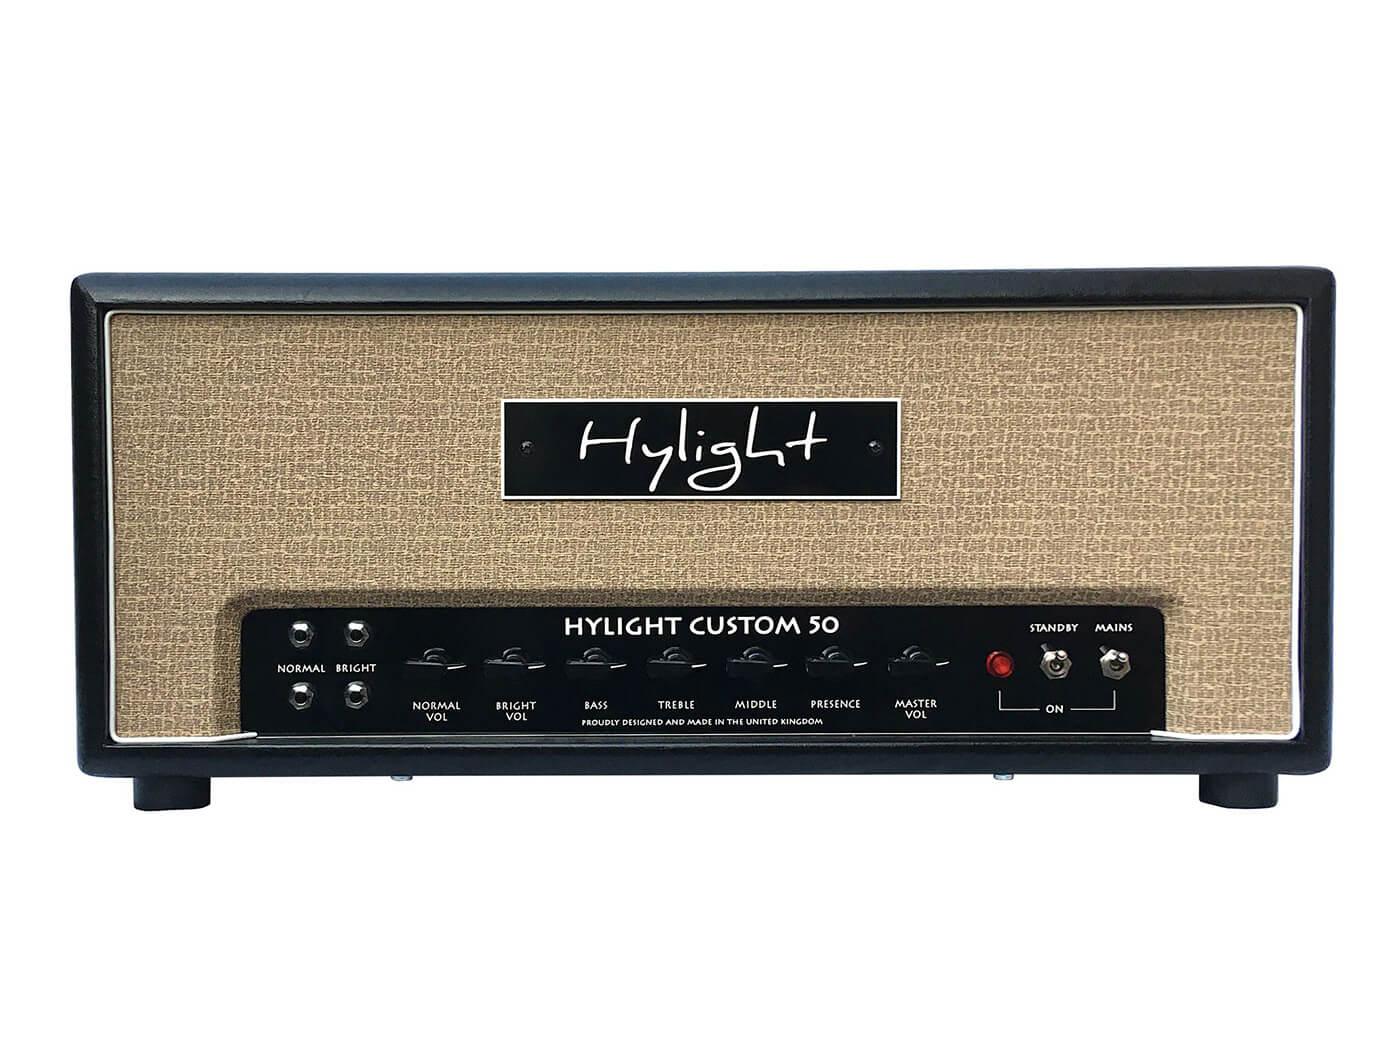 Hylight Custom 50